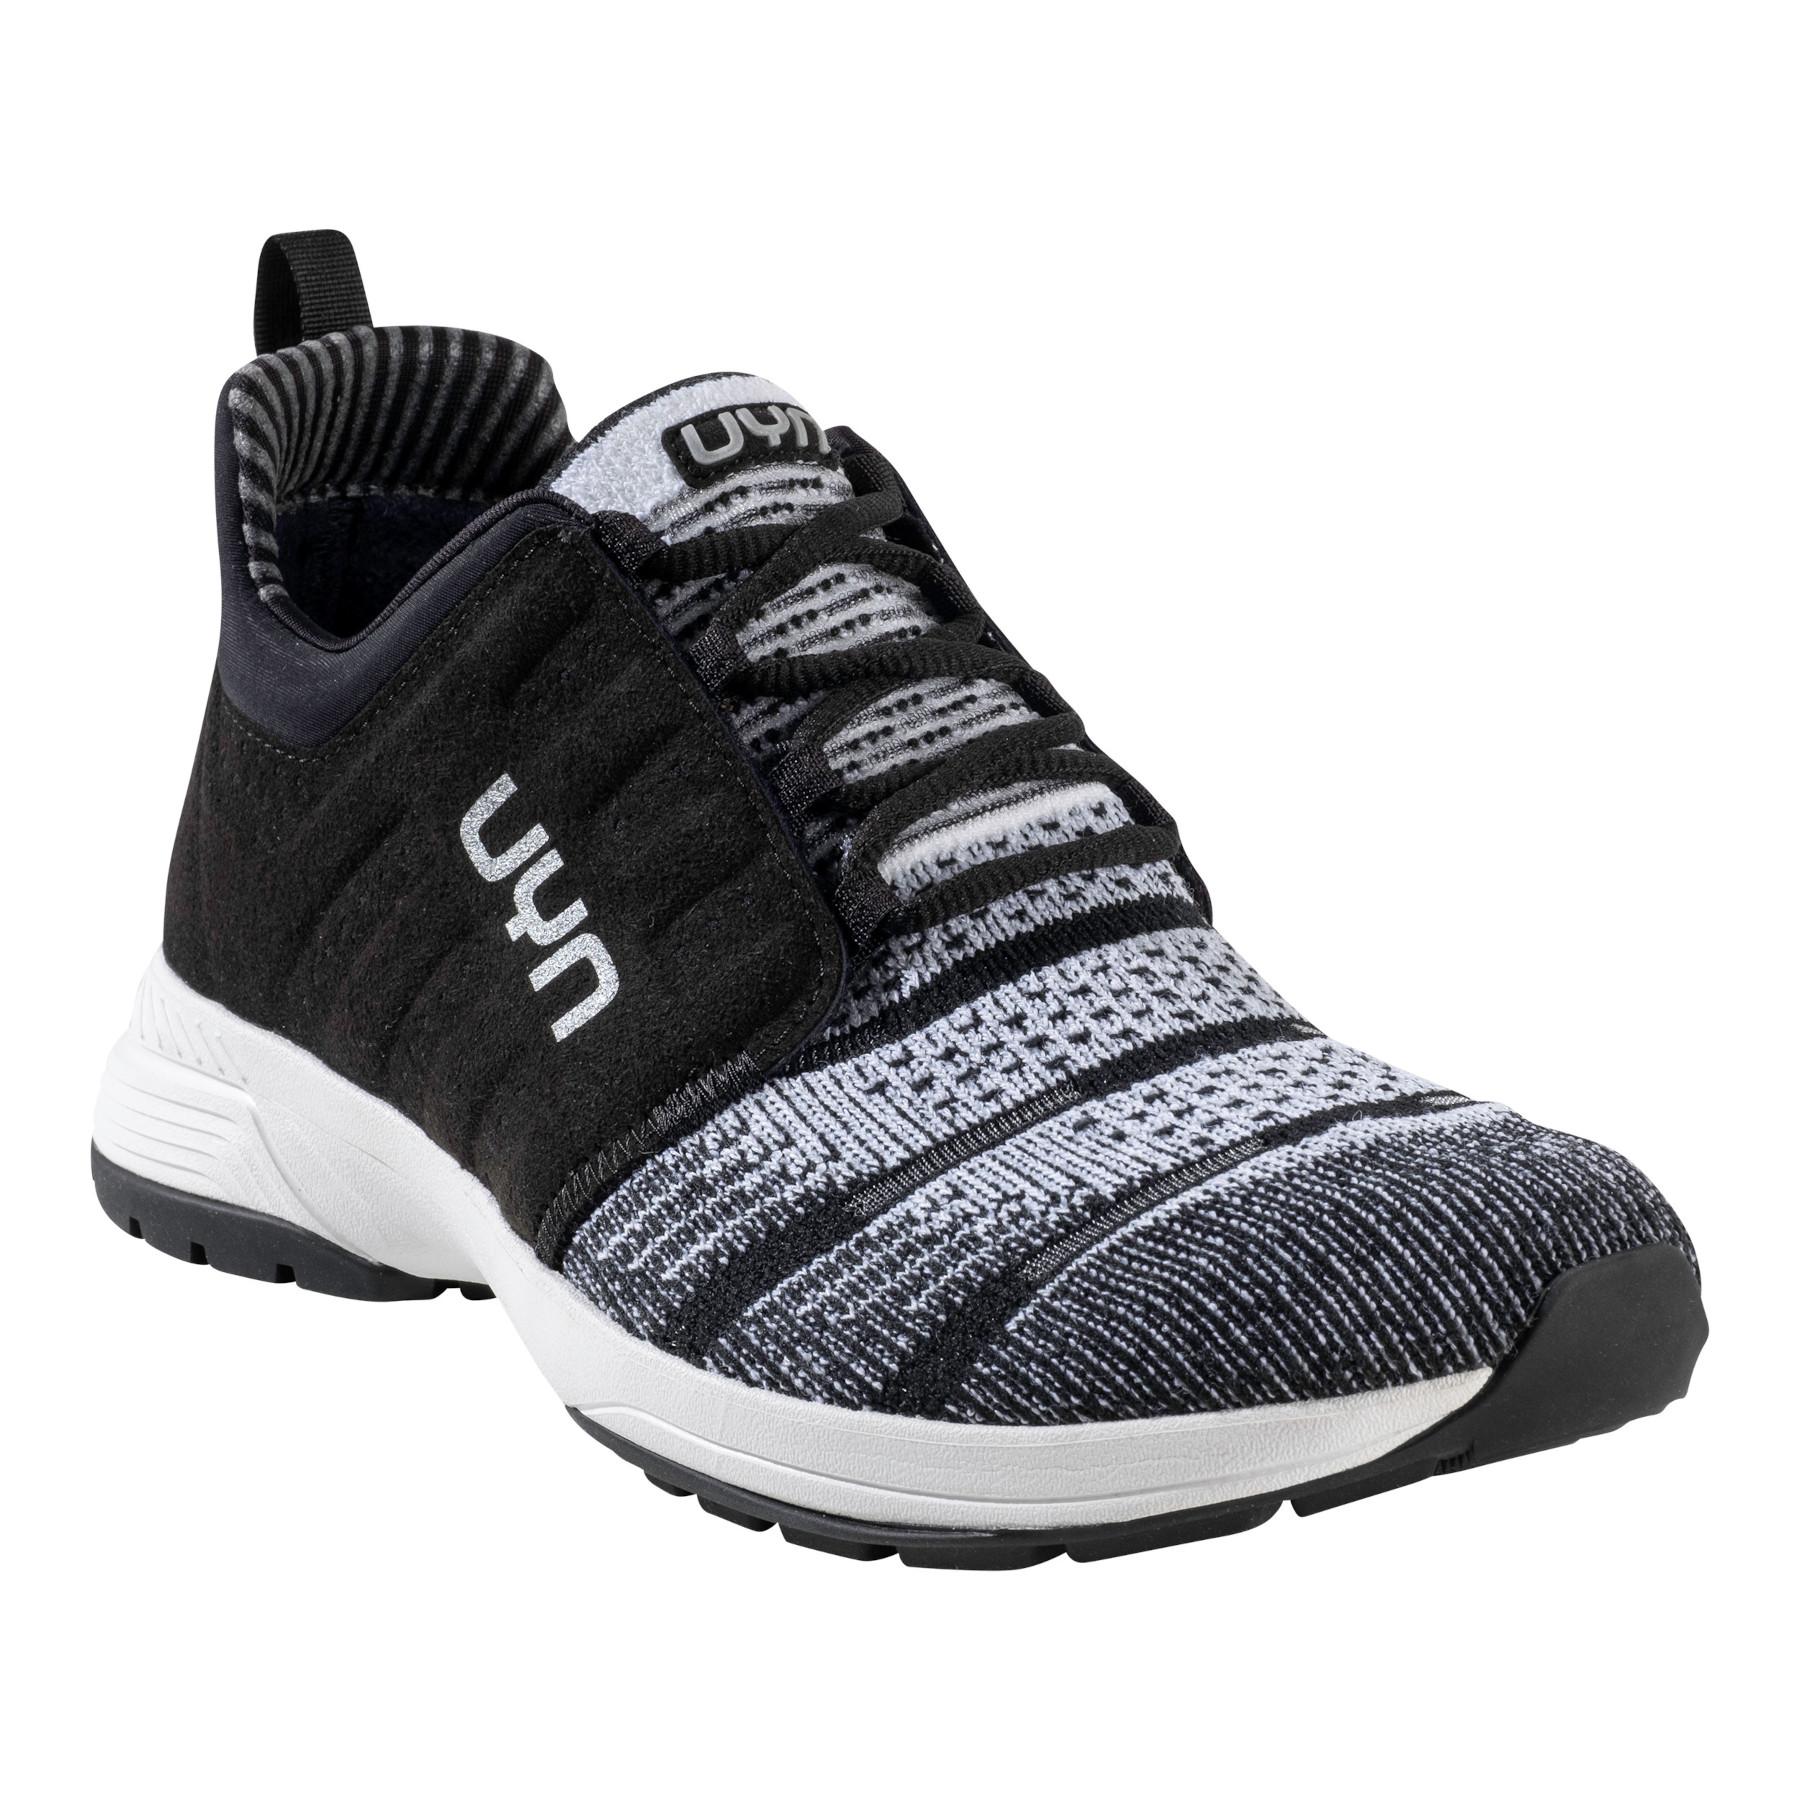 UYN Air Dual Tune Running Shoes - White/Black